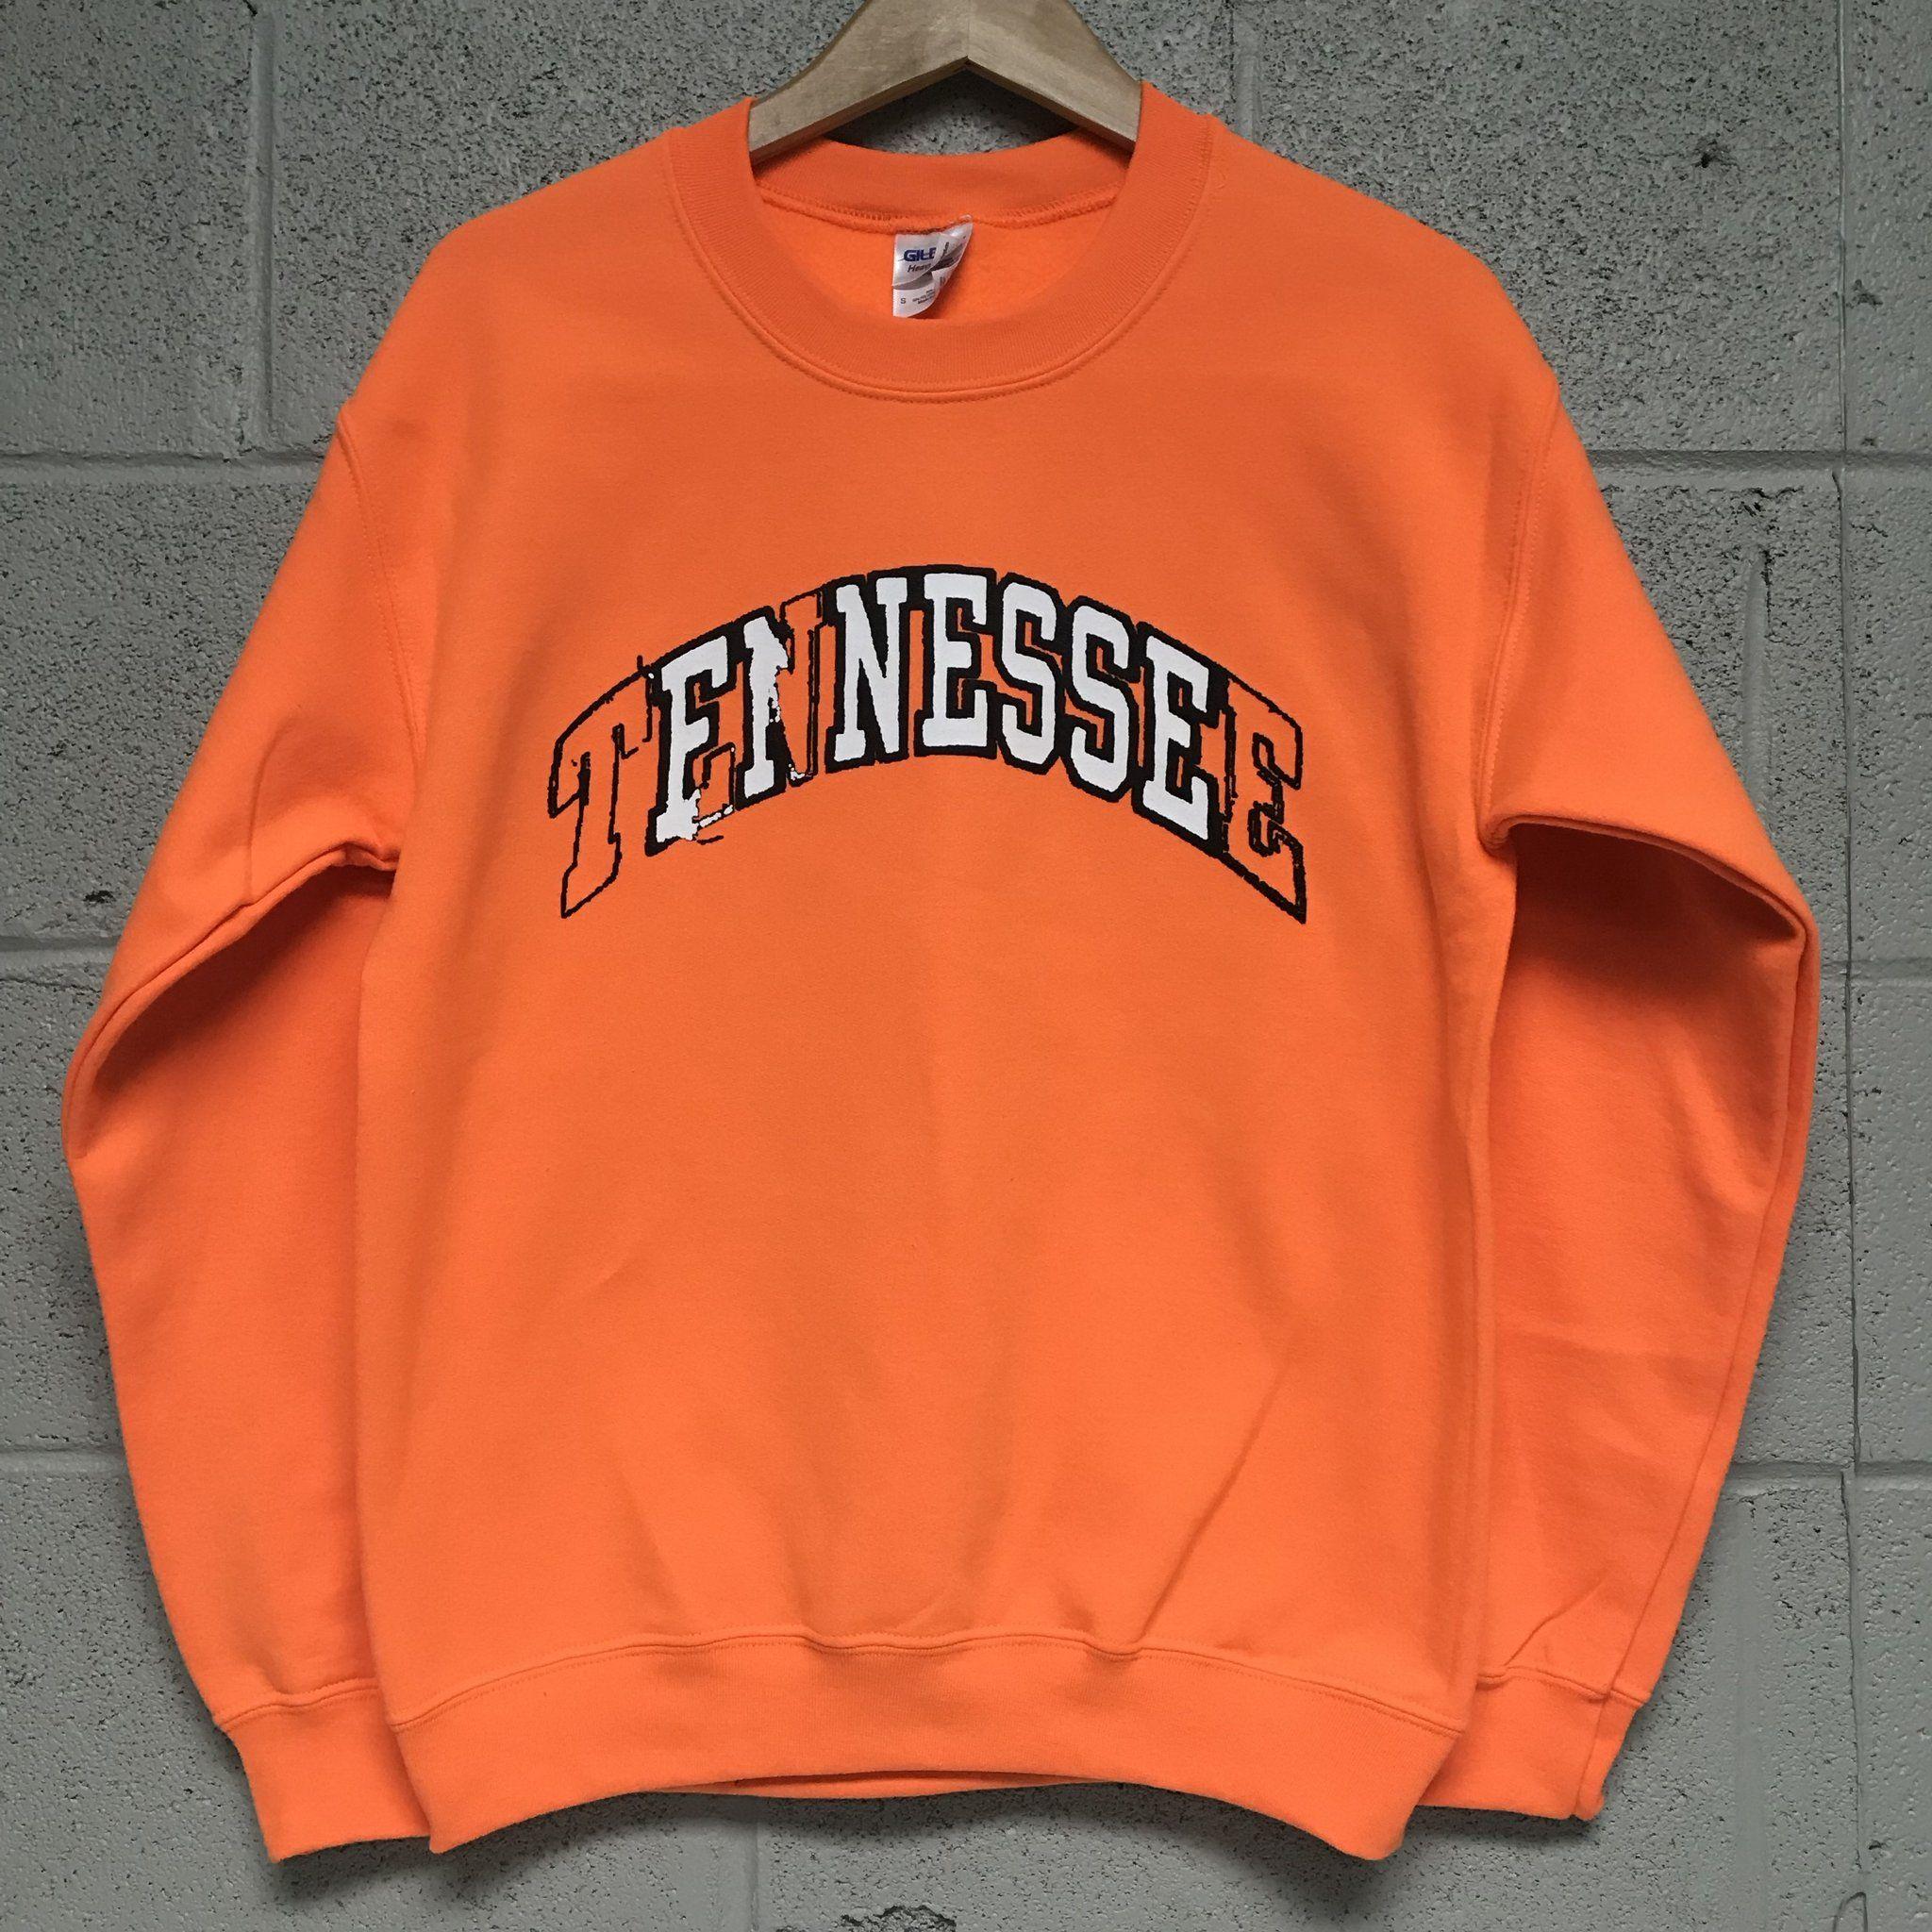 Drake Tennessee Finesse Men S Orange Sweatshirt Sweatshirts Orange Sweatshirts Printed Sweatshirts [ 2048 x 2048 Pixel ]